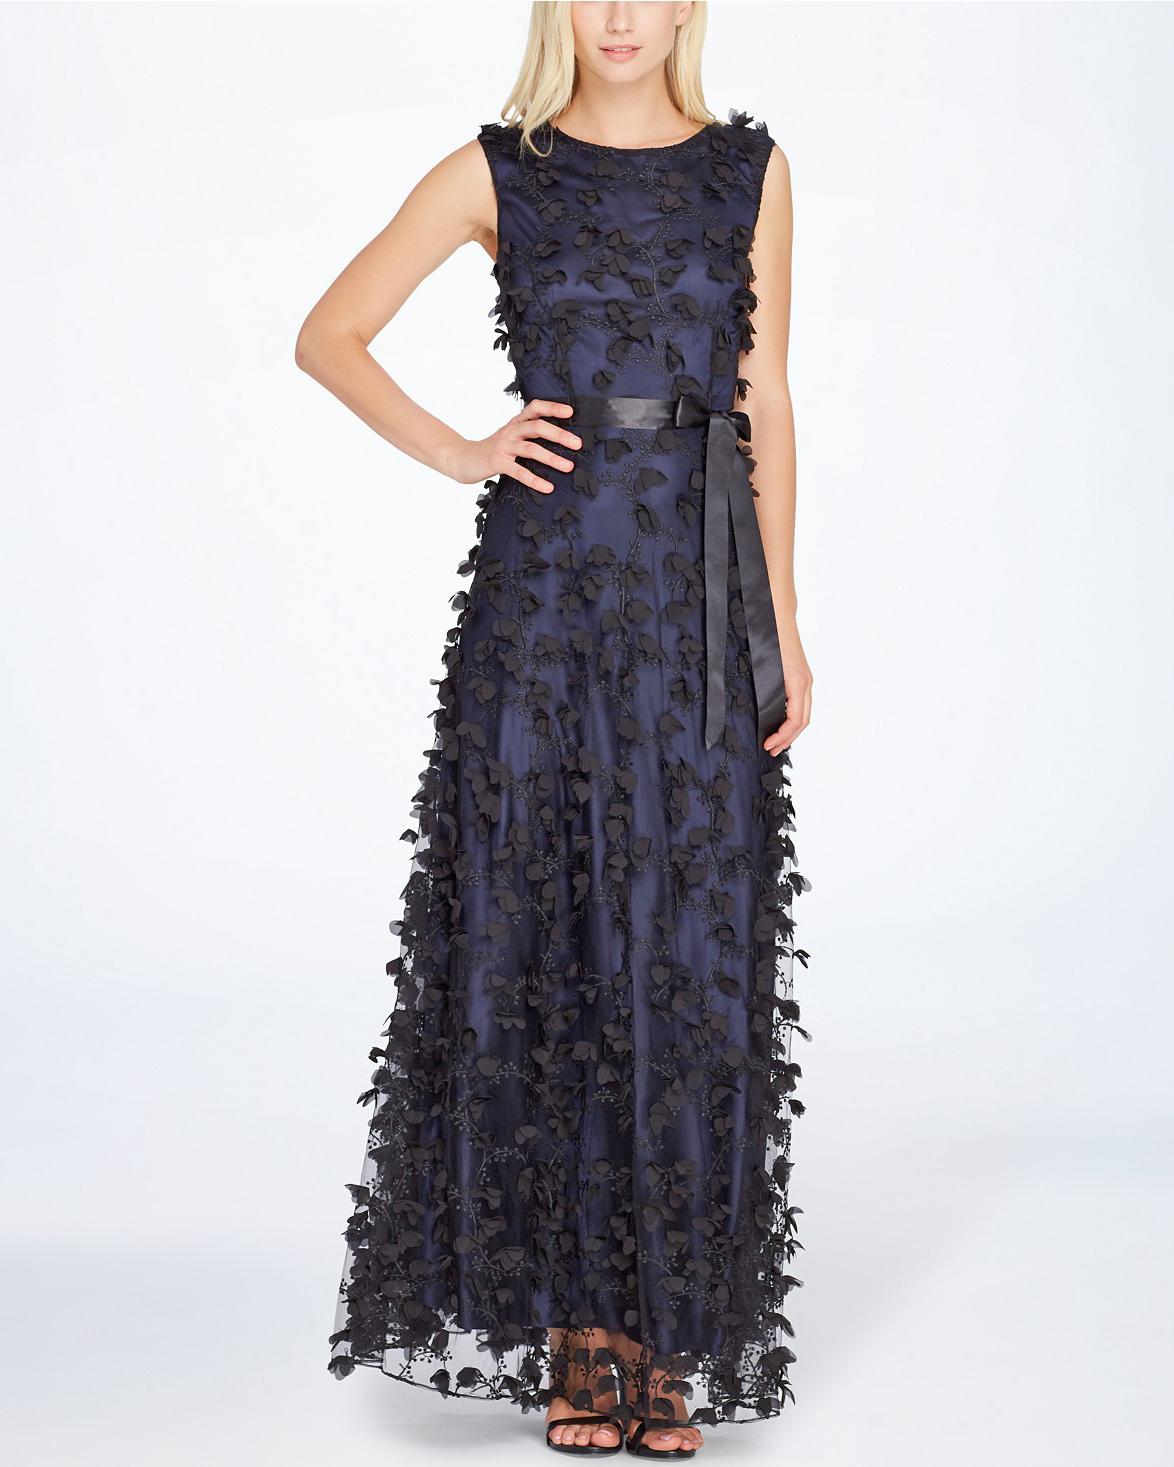 Tahari ASL Floral Applique Gown